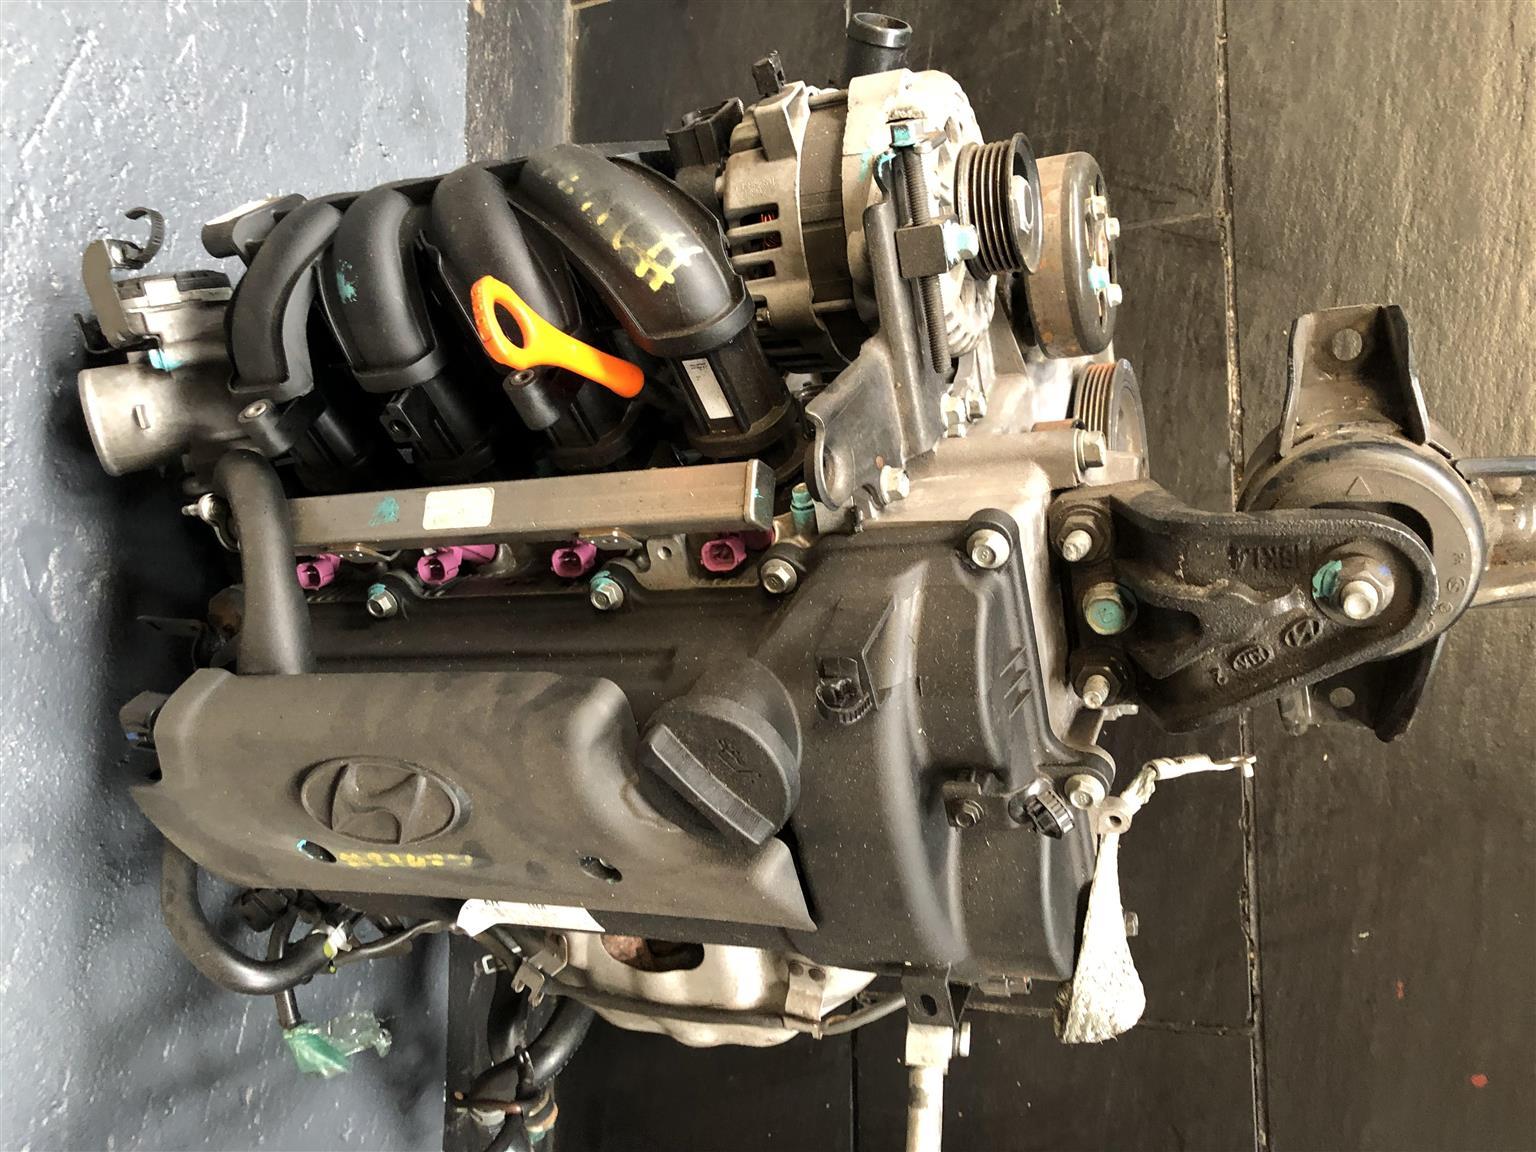 HYUNDAI I10 ENGINE FOR SALE